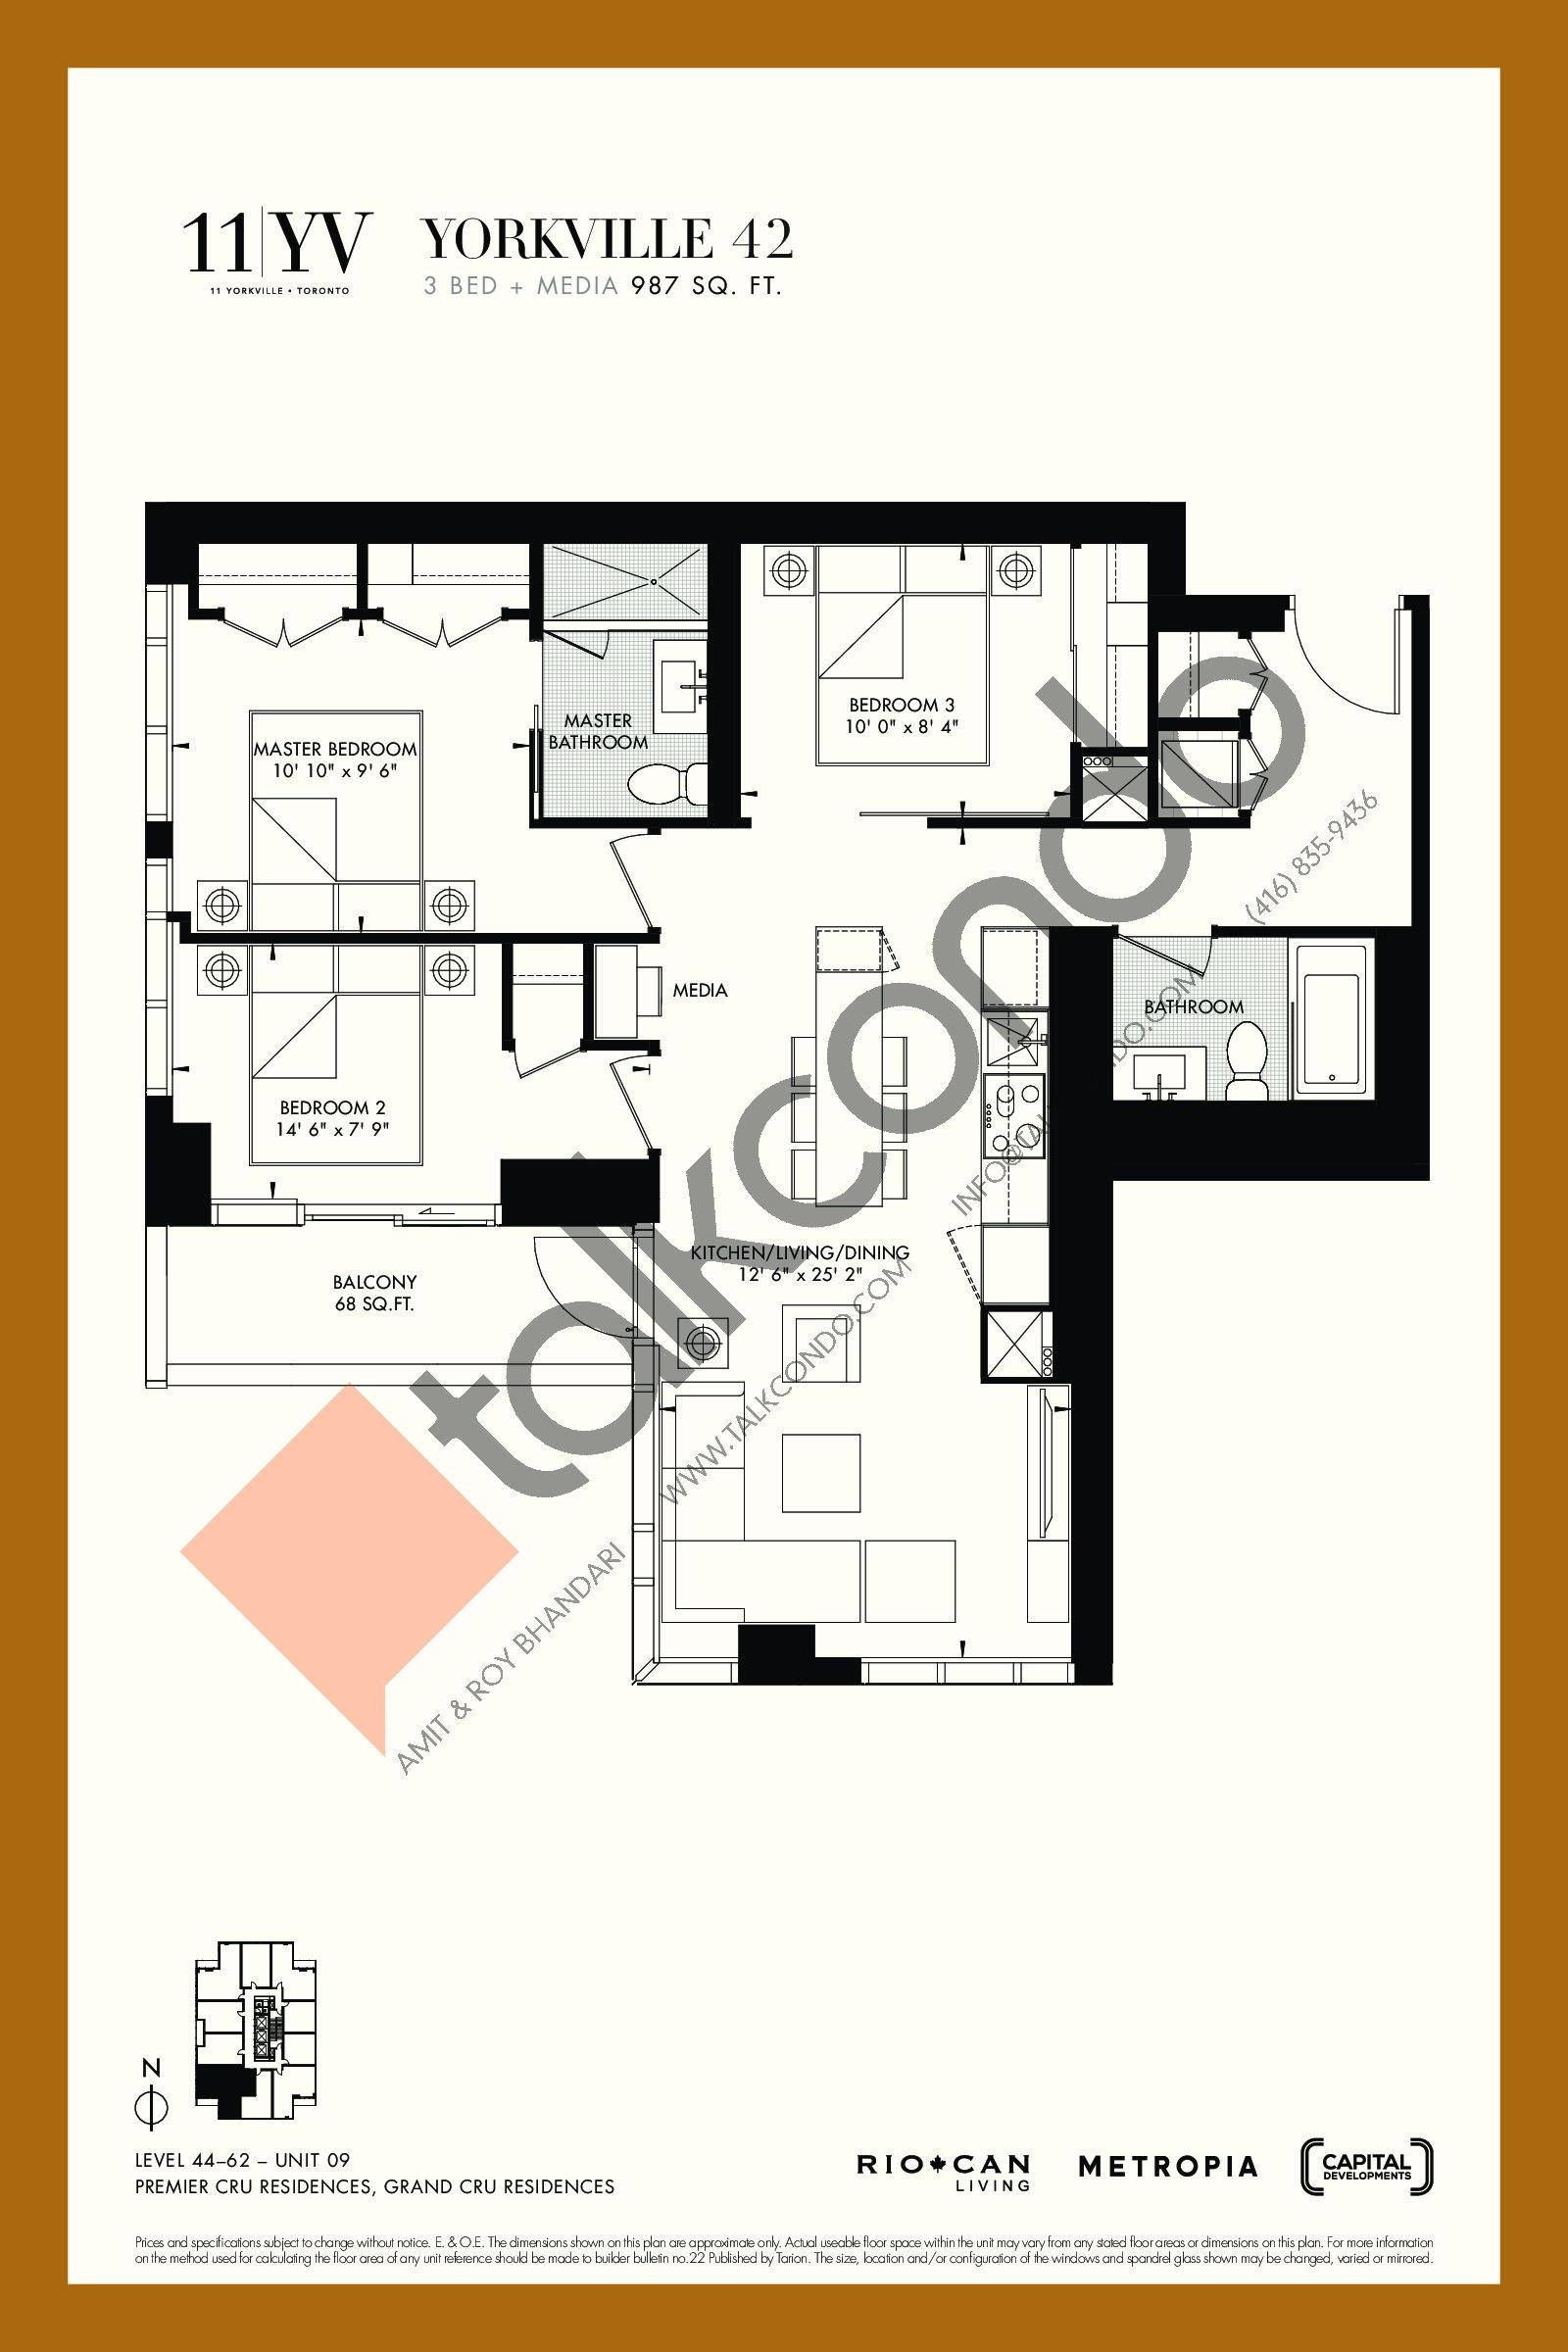 Yorkville 42 Floor Plan at 11YV Condos - 987 sq.ft